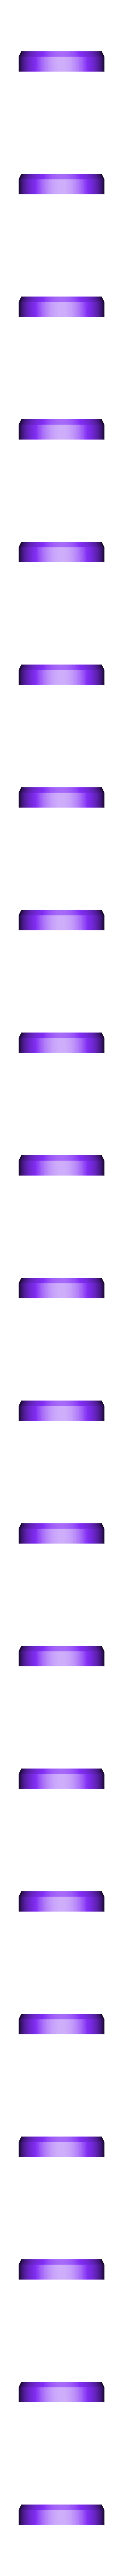 heart eyed emoji.STL Download STL file Emoji cookie cutter set • 3D print design, davidruizo